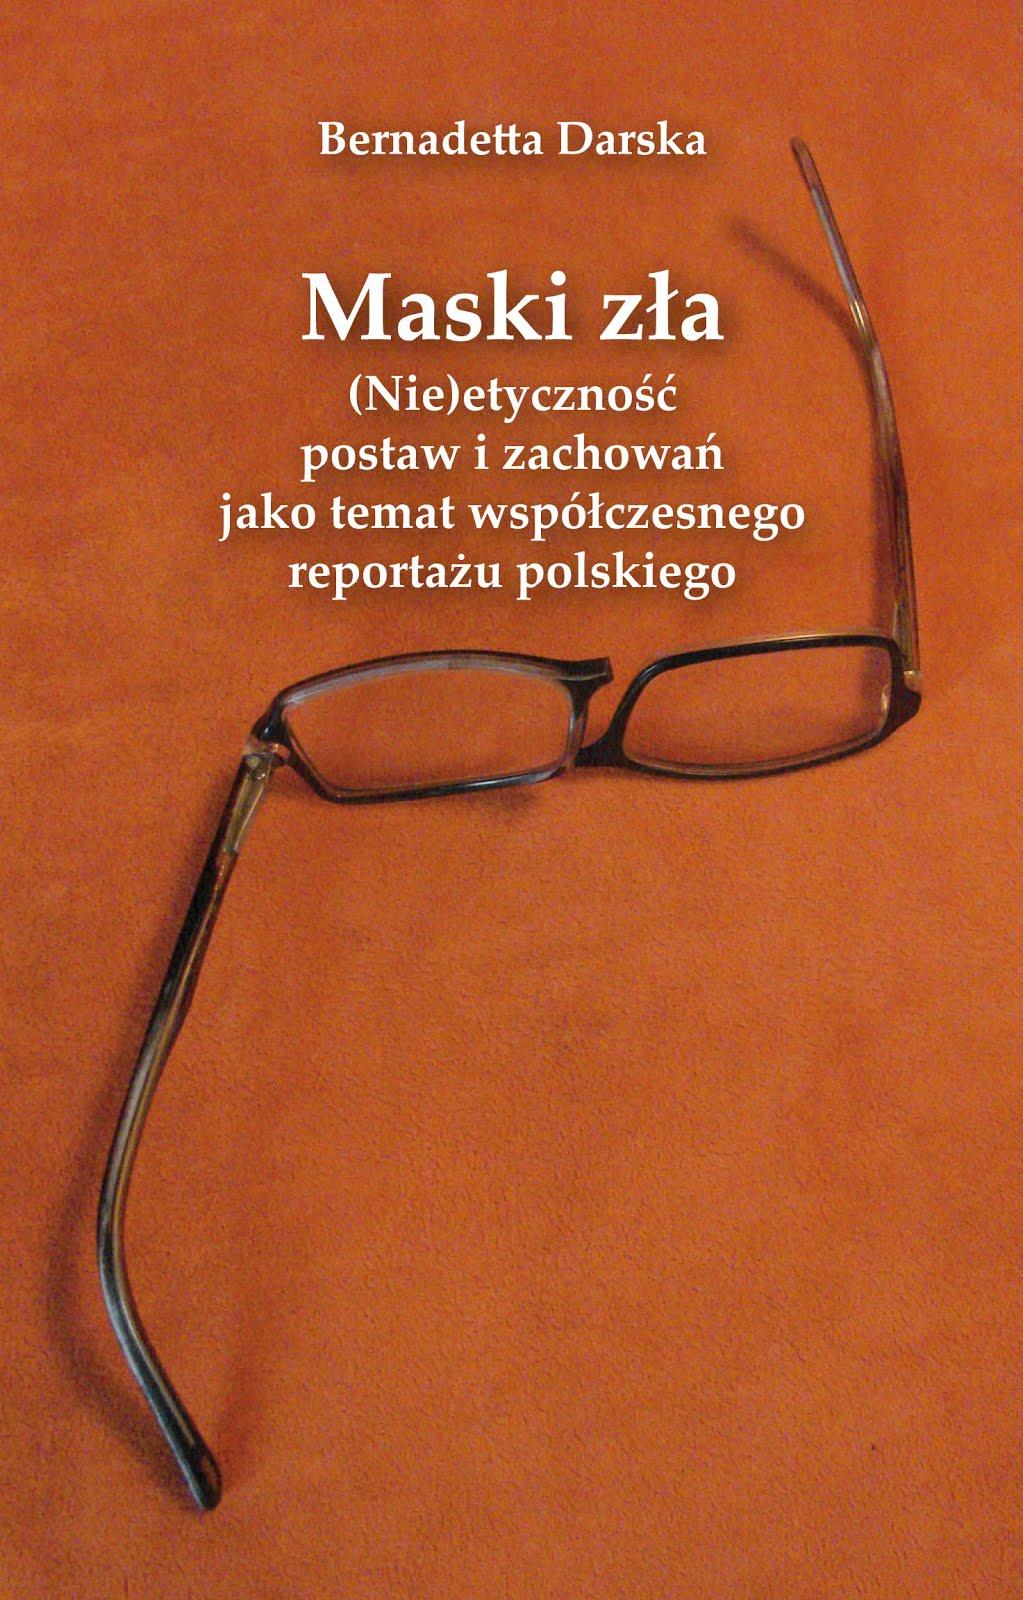 Maski zła